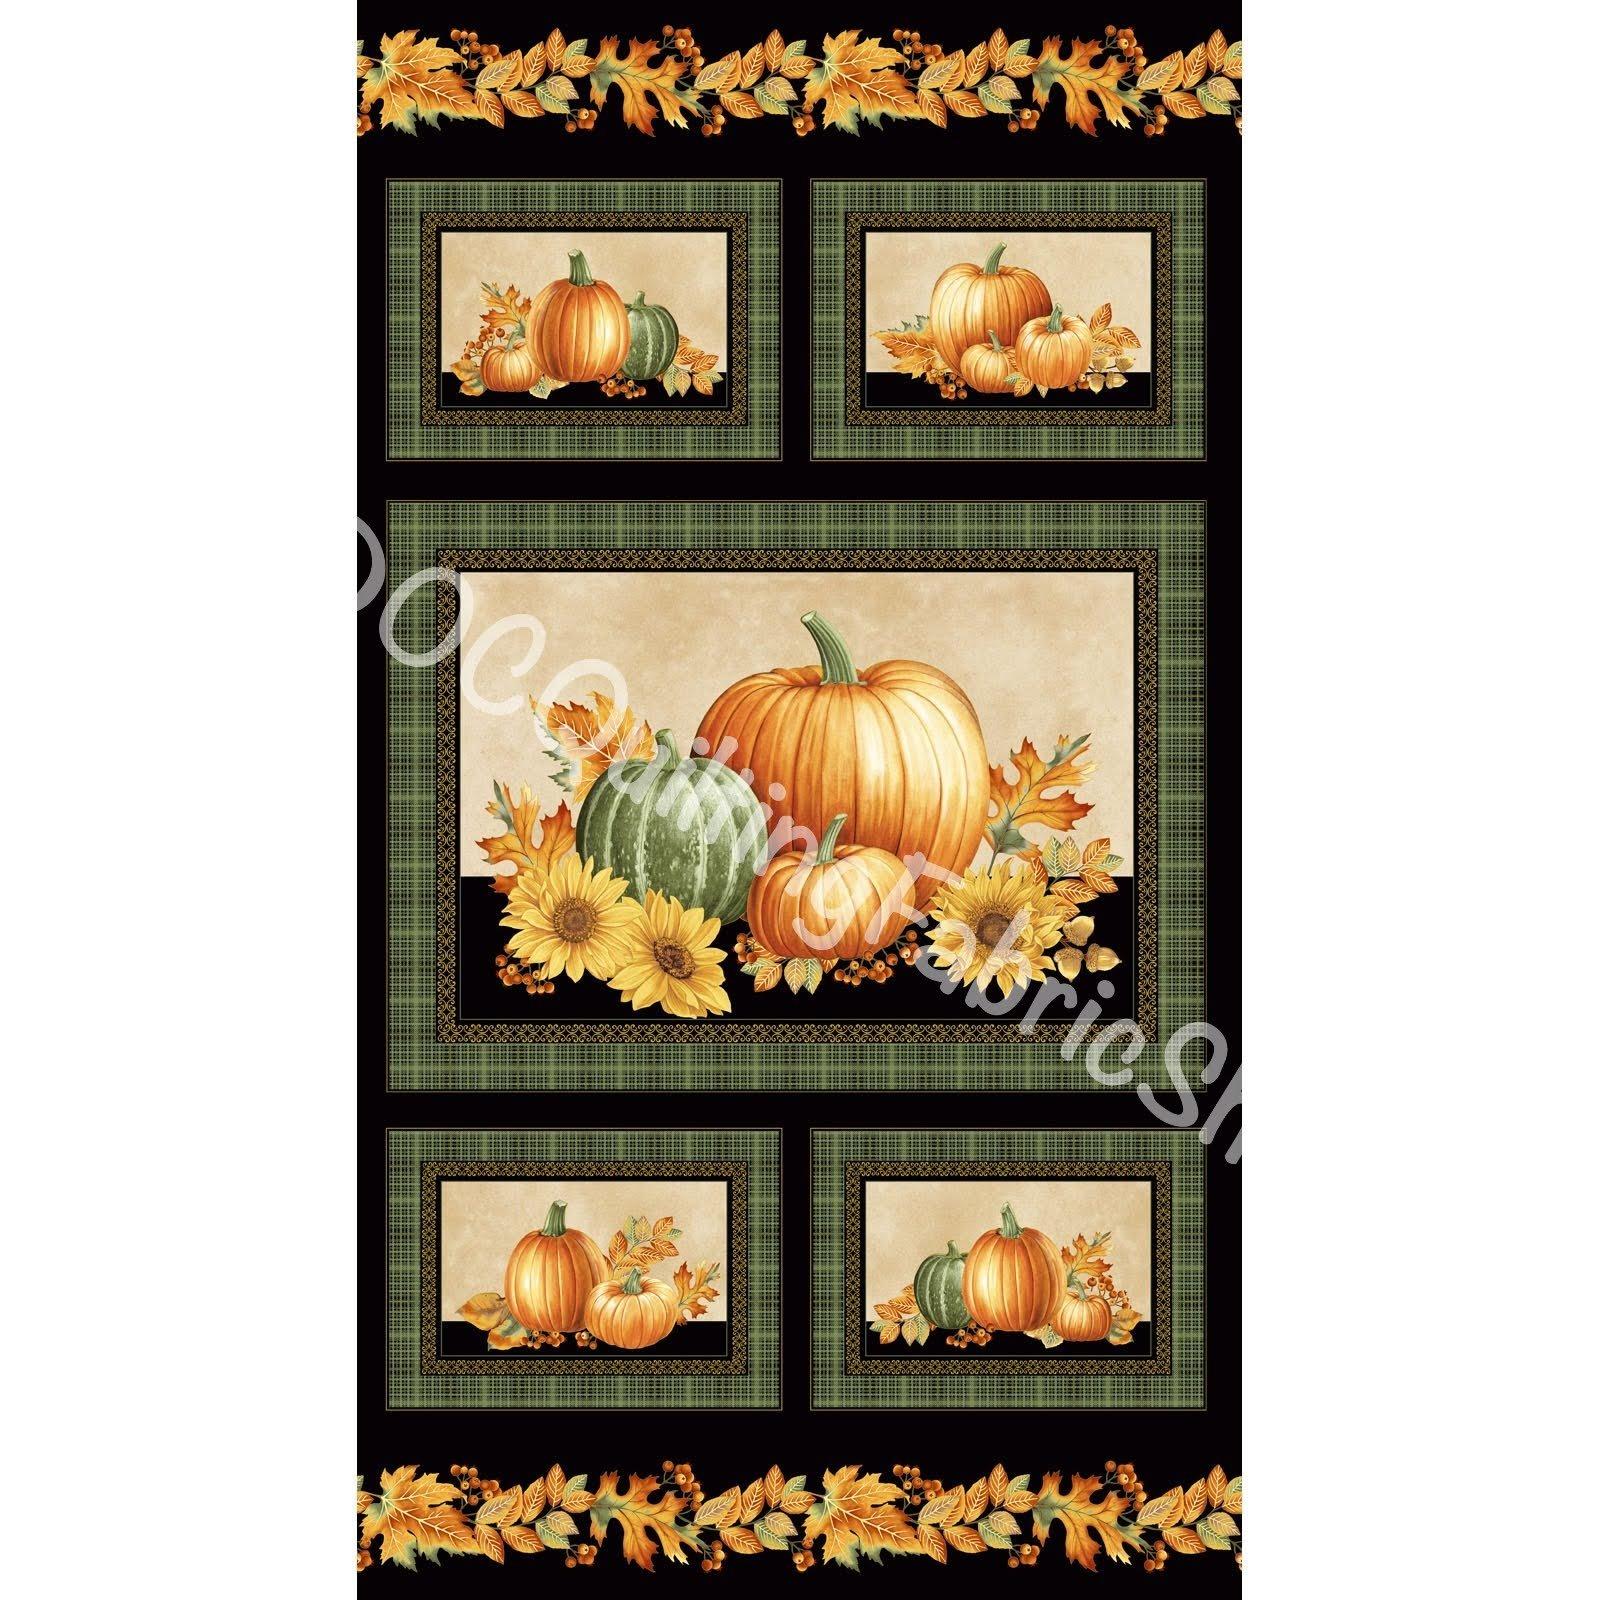 Benartex Autumn Elegance Panel Metallic 24 inches